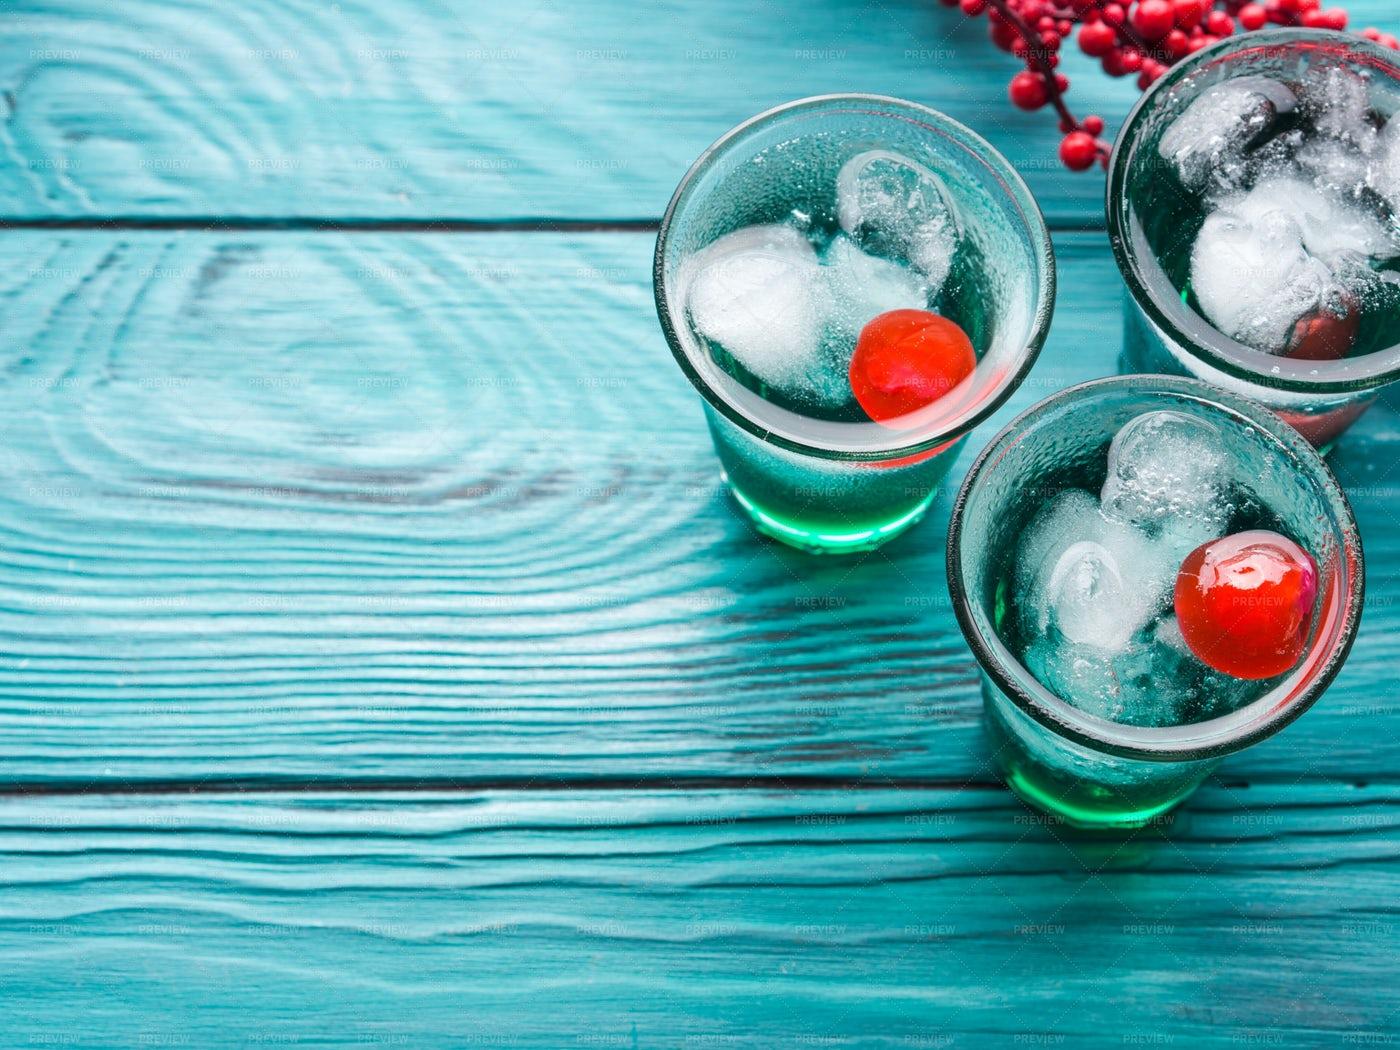 Green Iced Drinks: Stock Photos